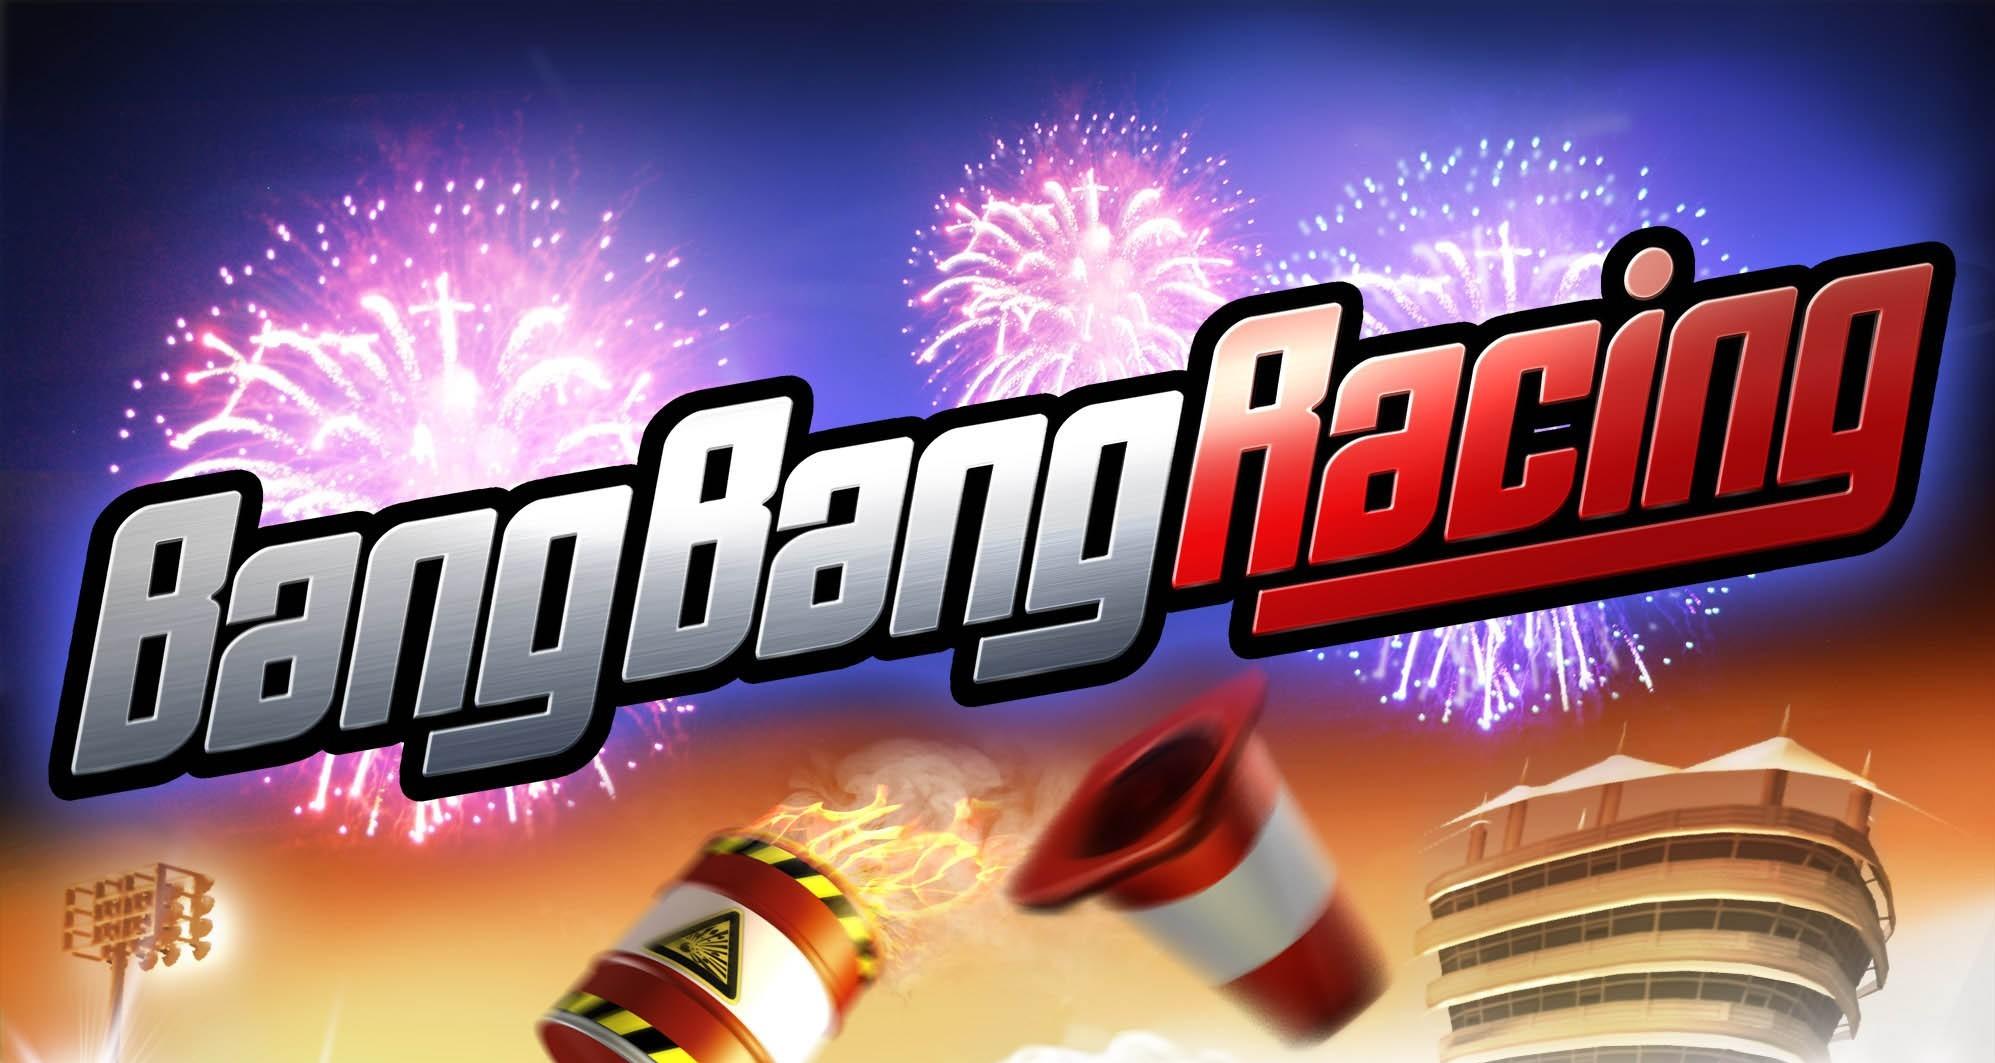 BangBangRacing stuff